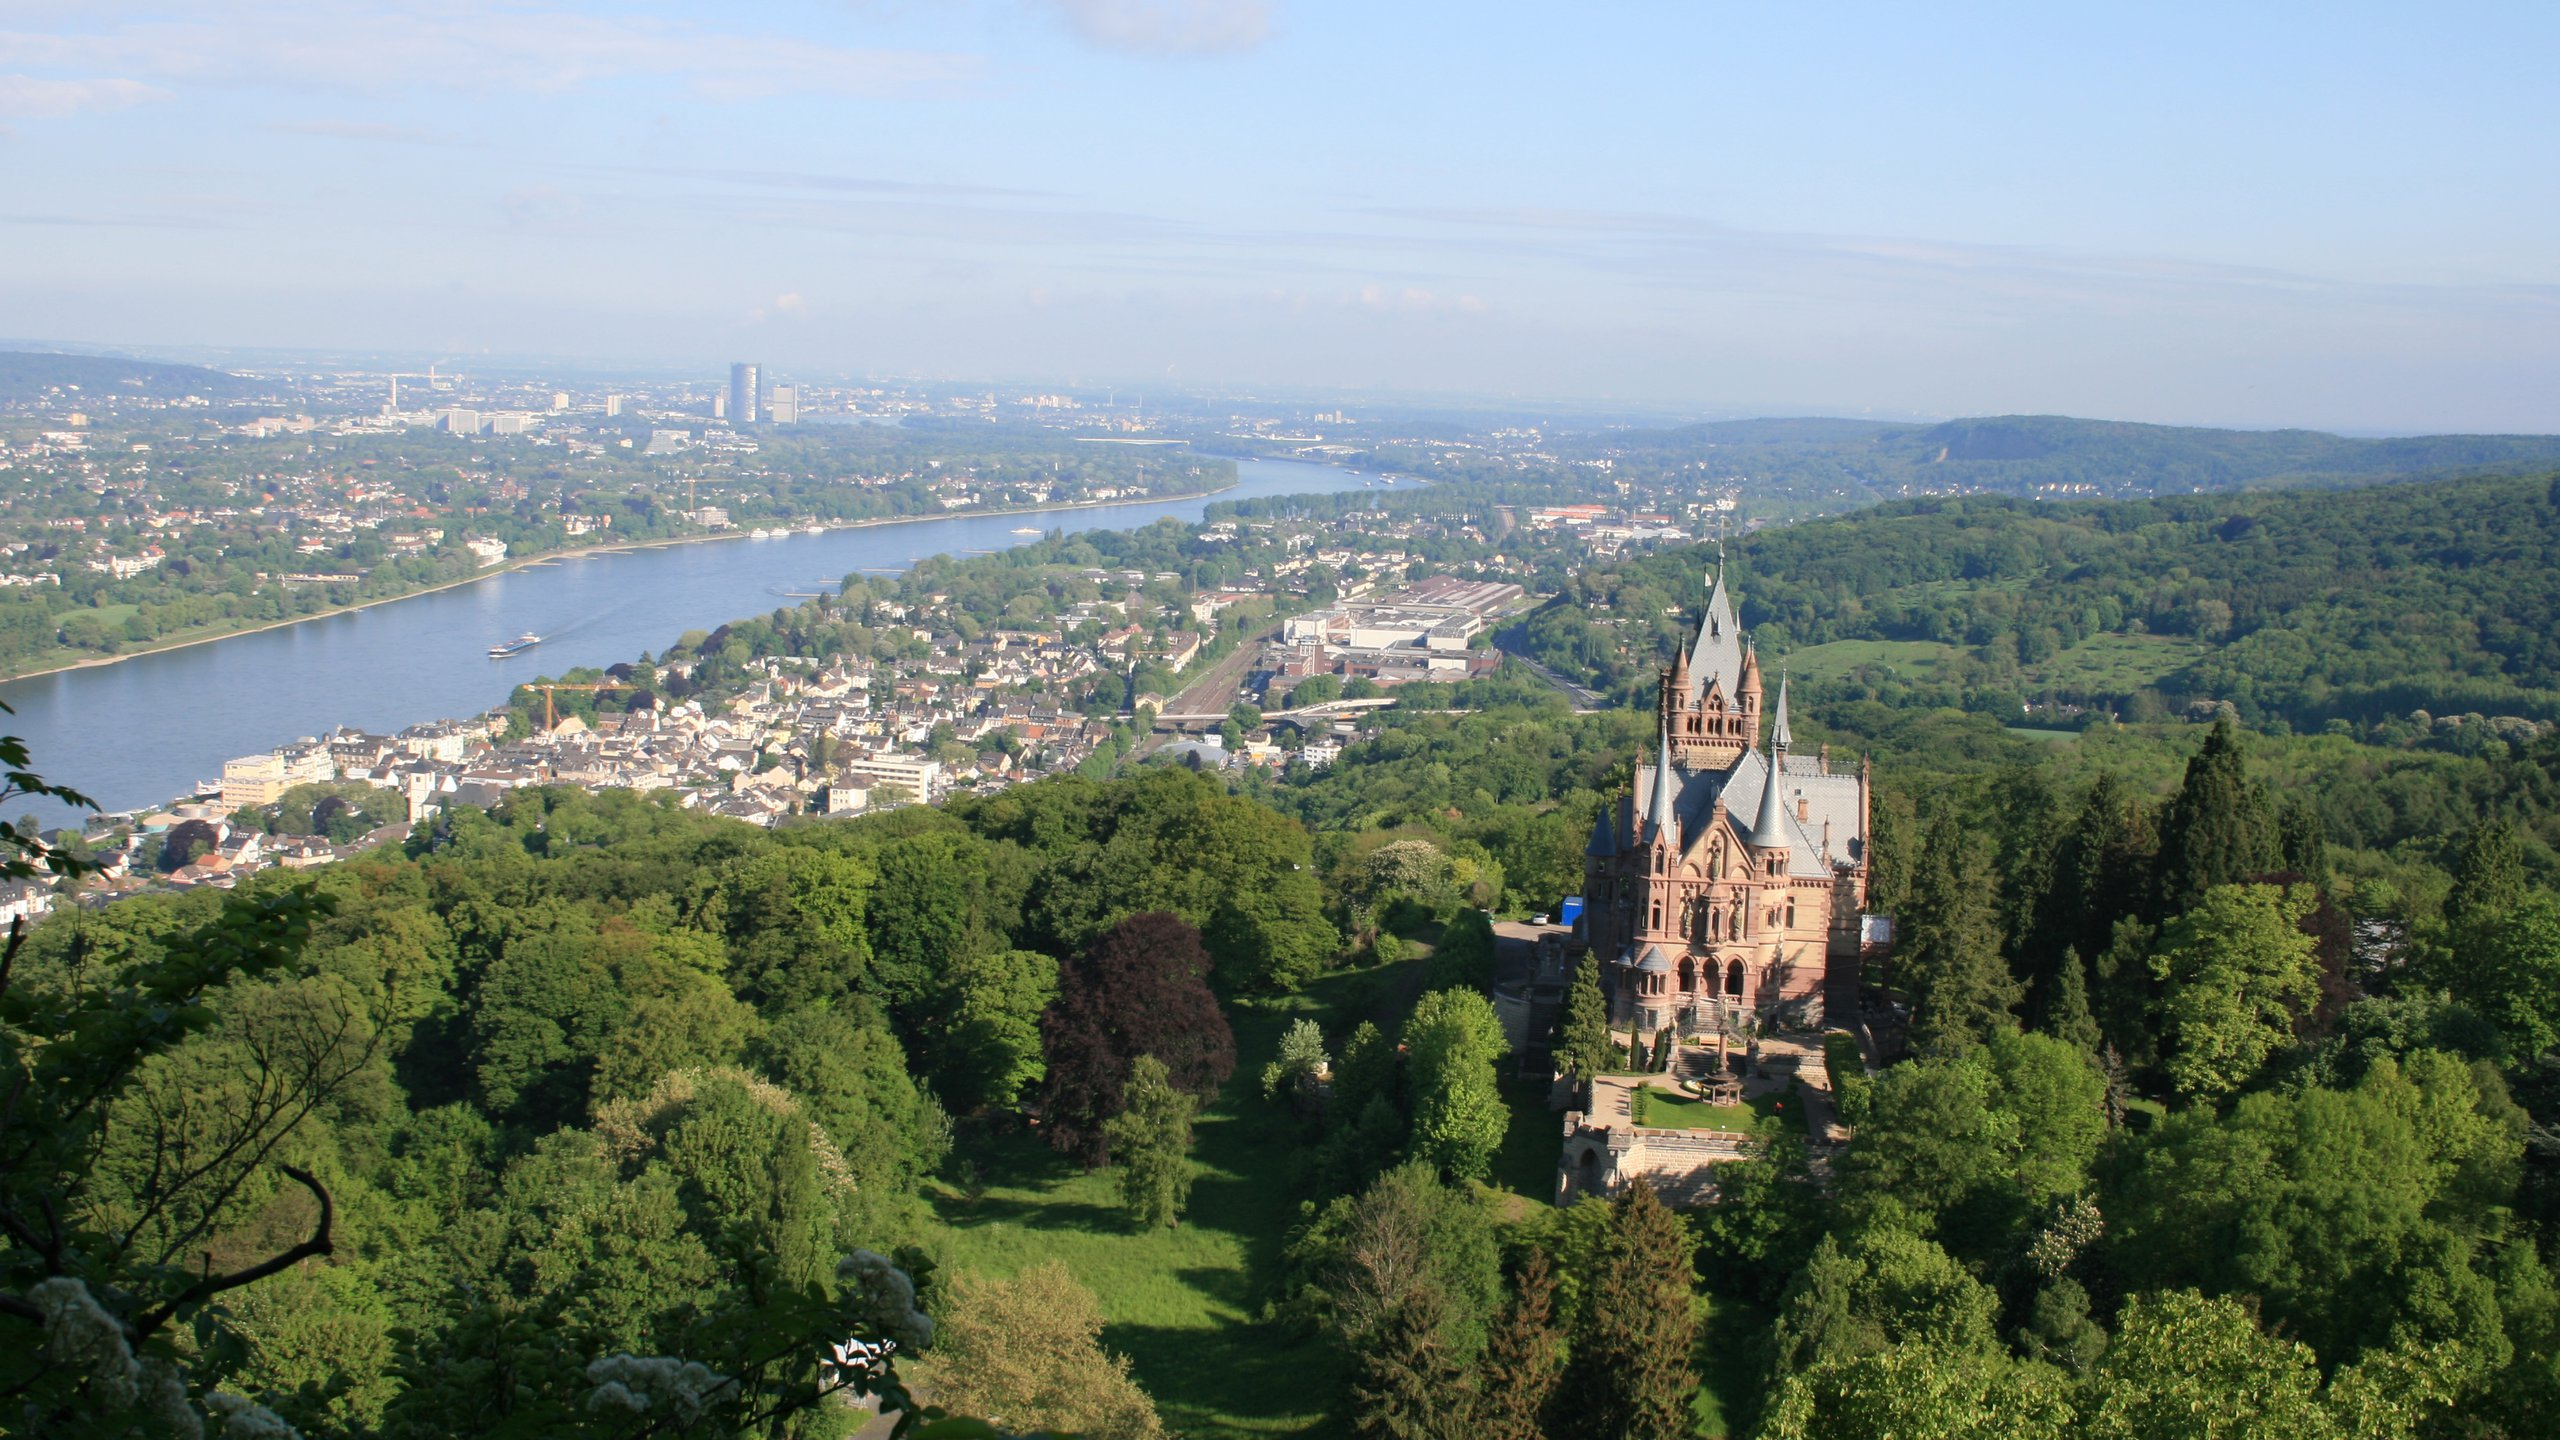 Rhein-Sieg-Kreis District, North Rhine-Westphalia, Germany